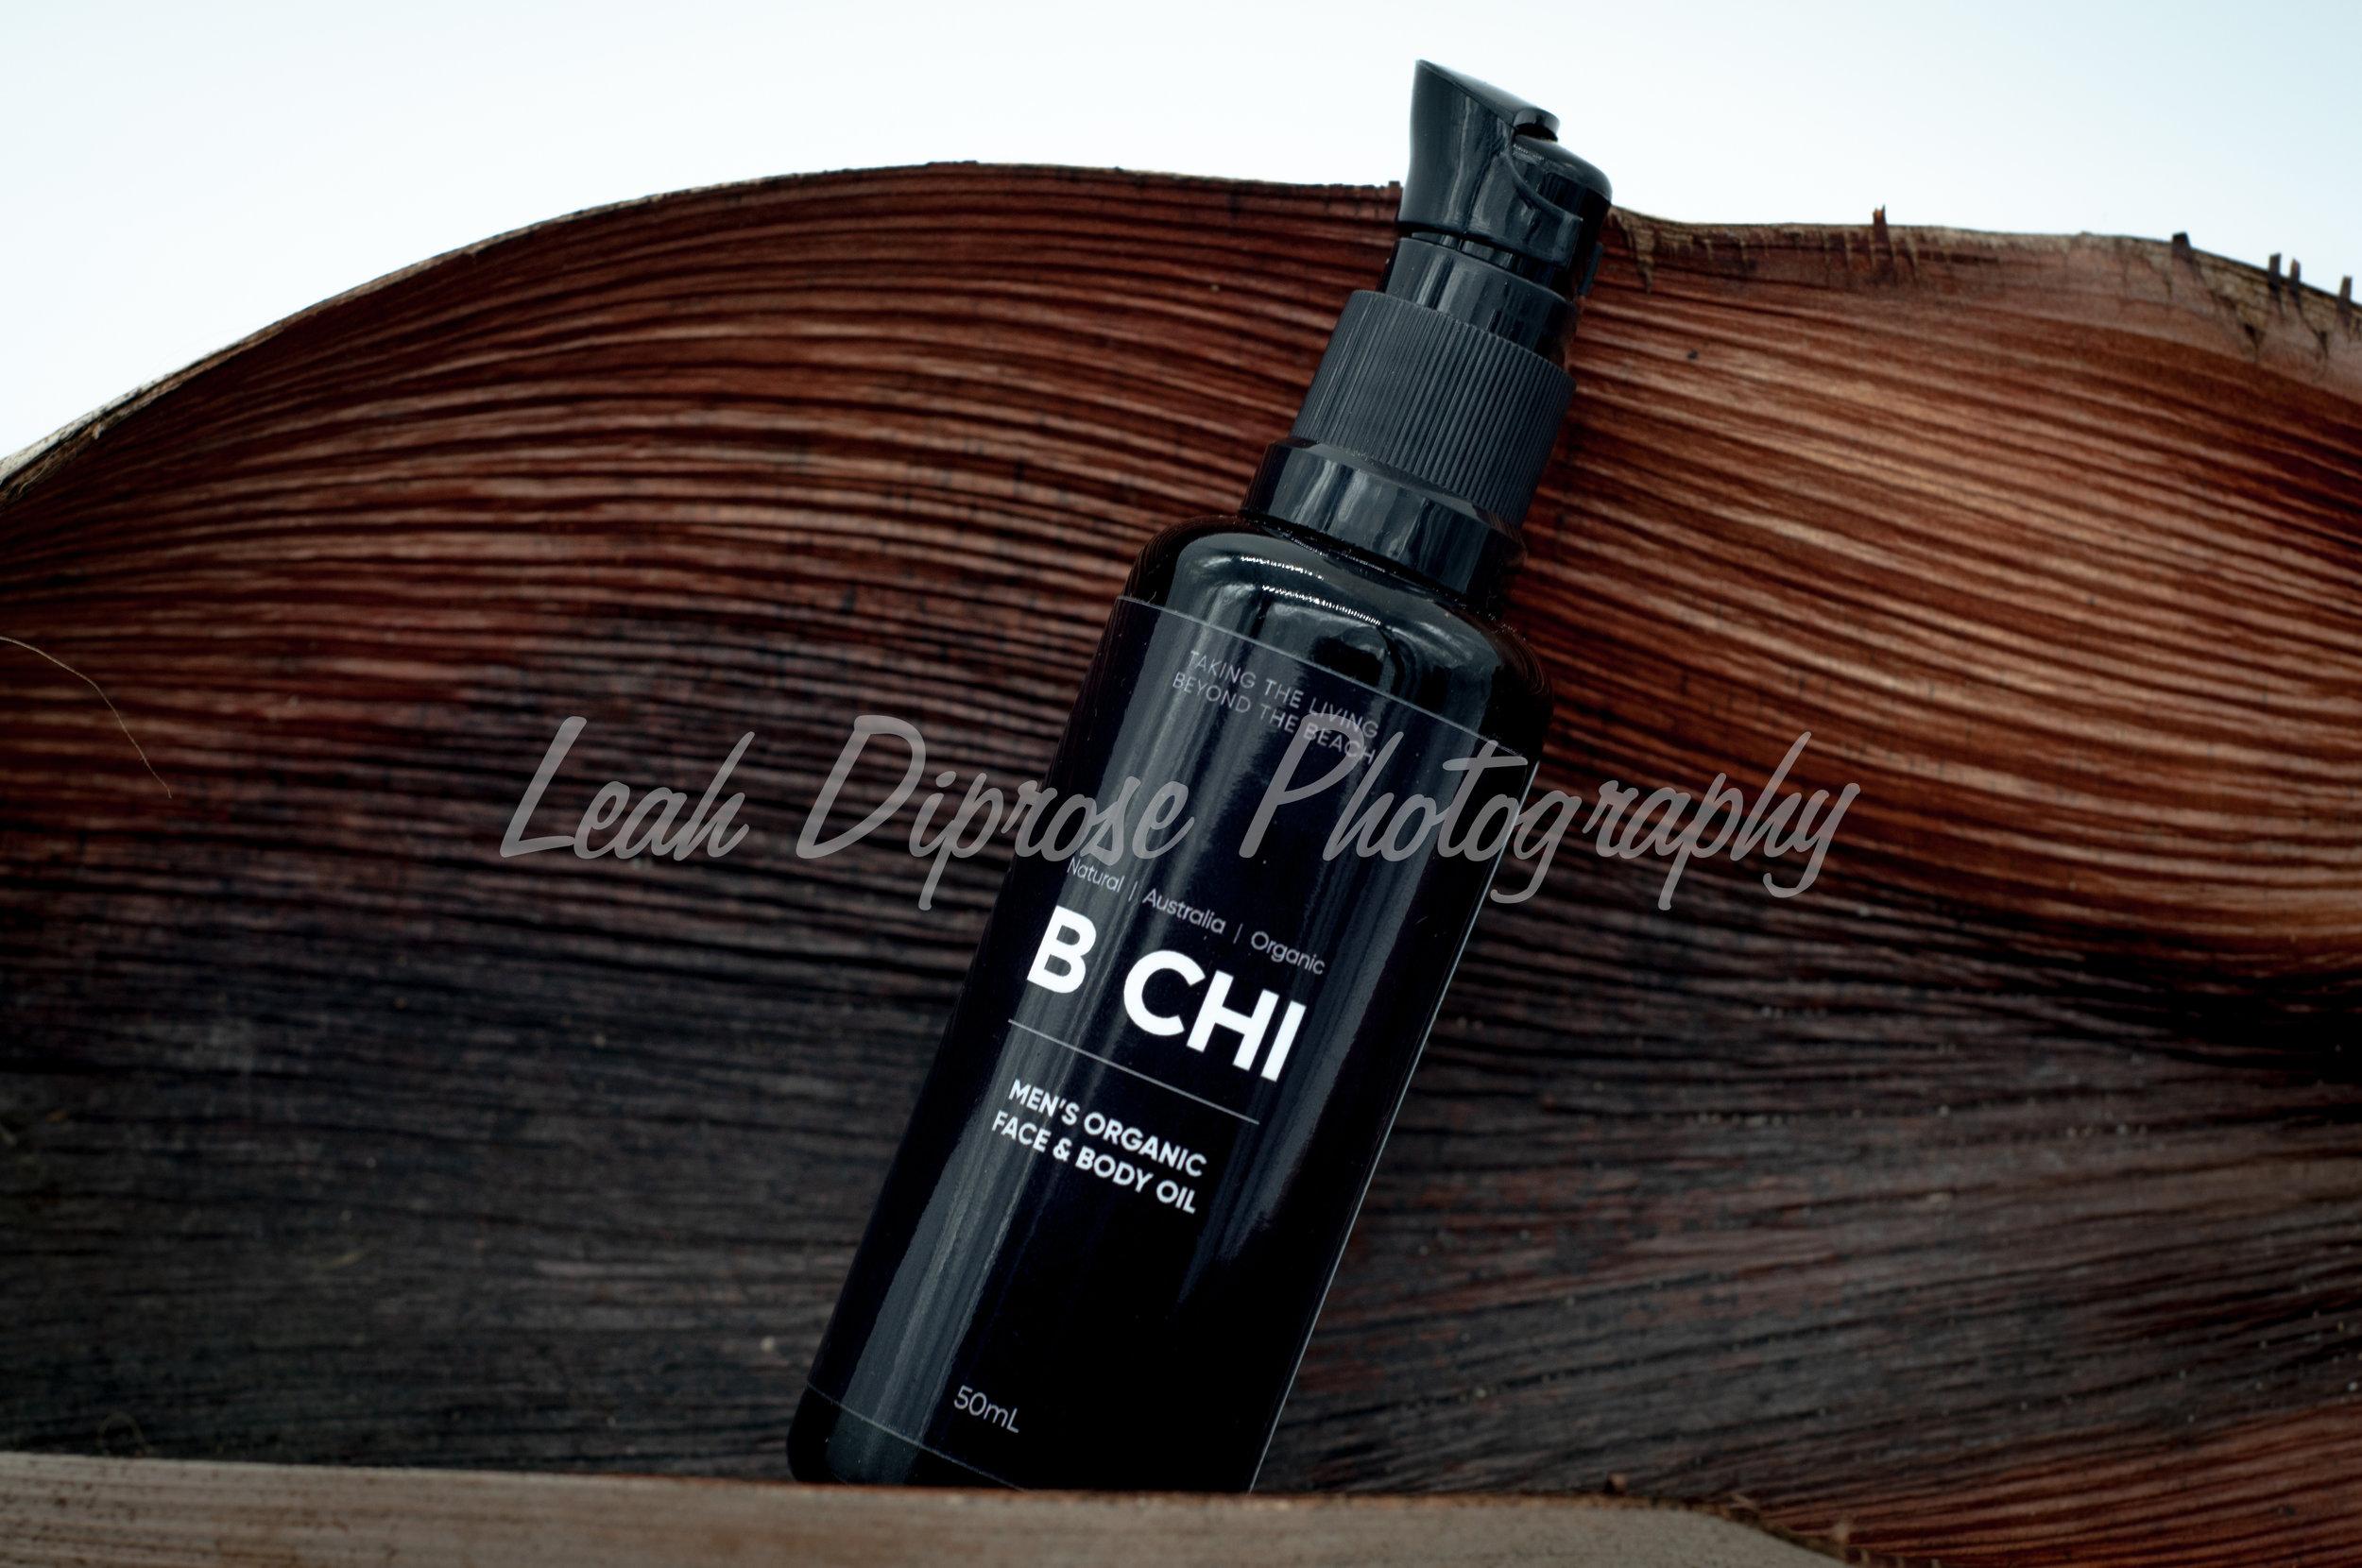 Leah Diprose Photography image-1093.jpg